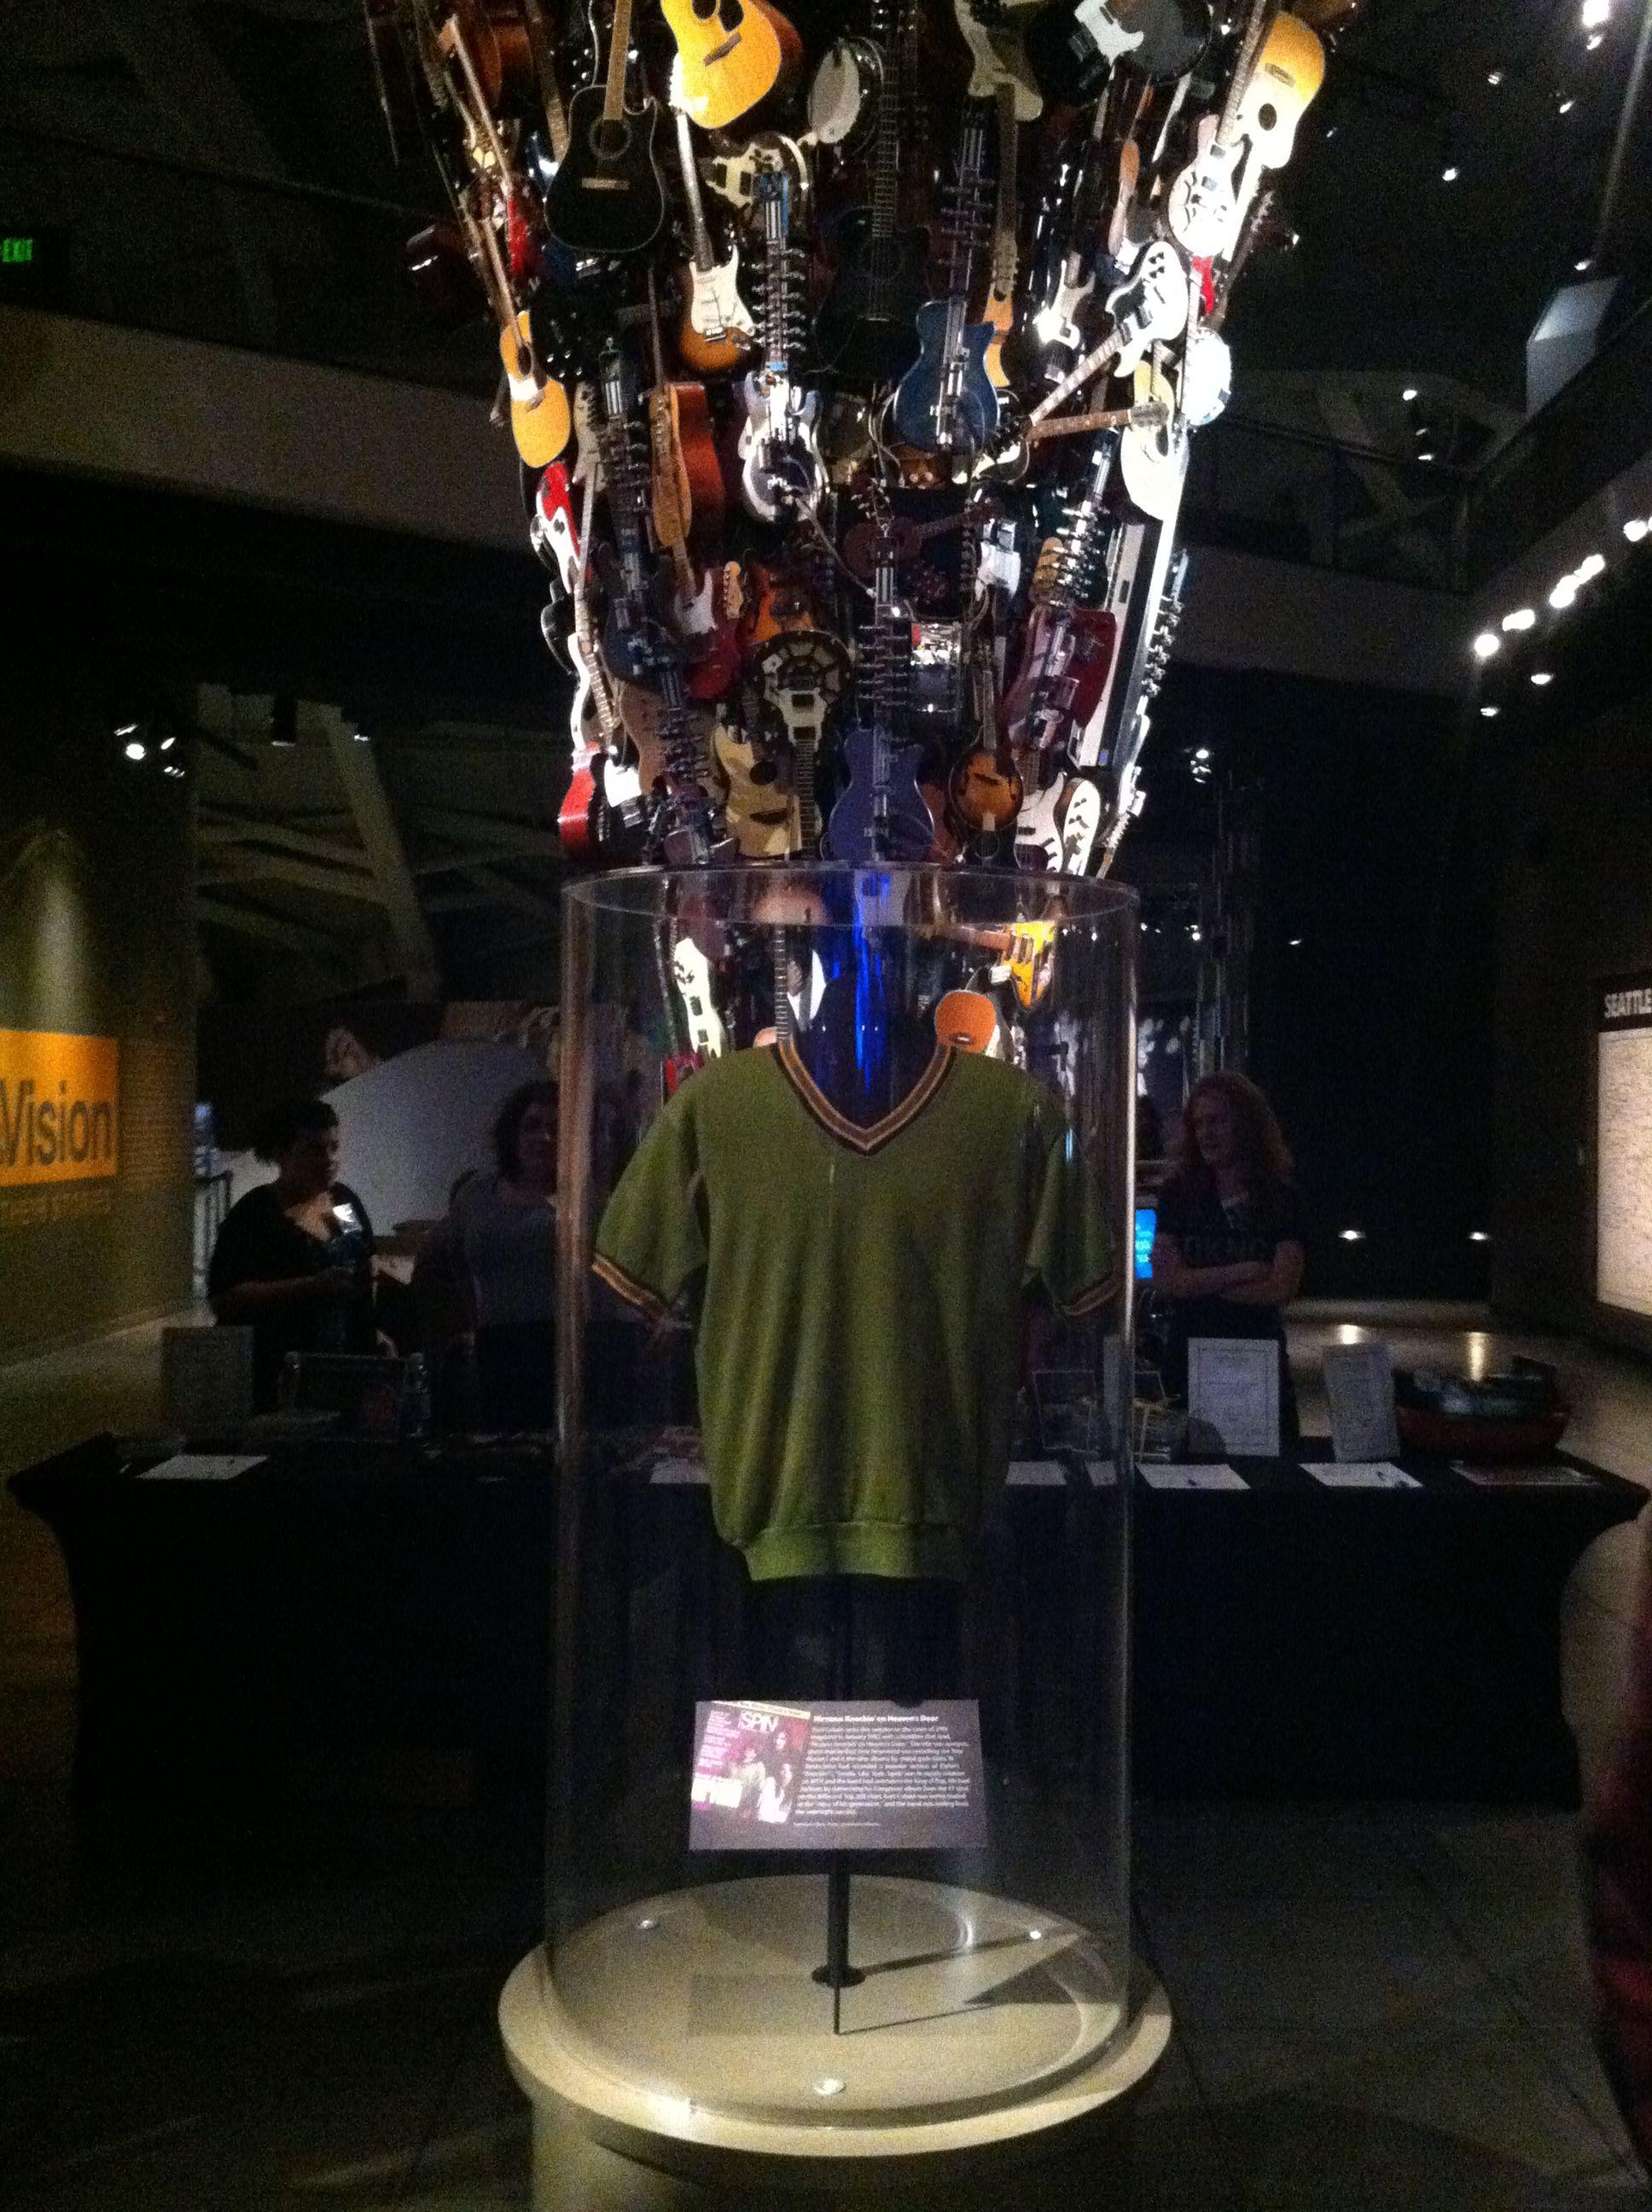 EMP Seattle Nirvana Exhibit. Kurt Cobain's shirt.